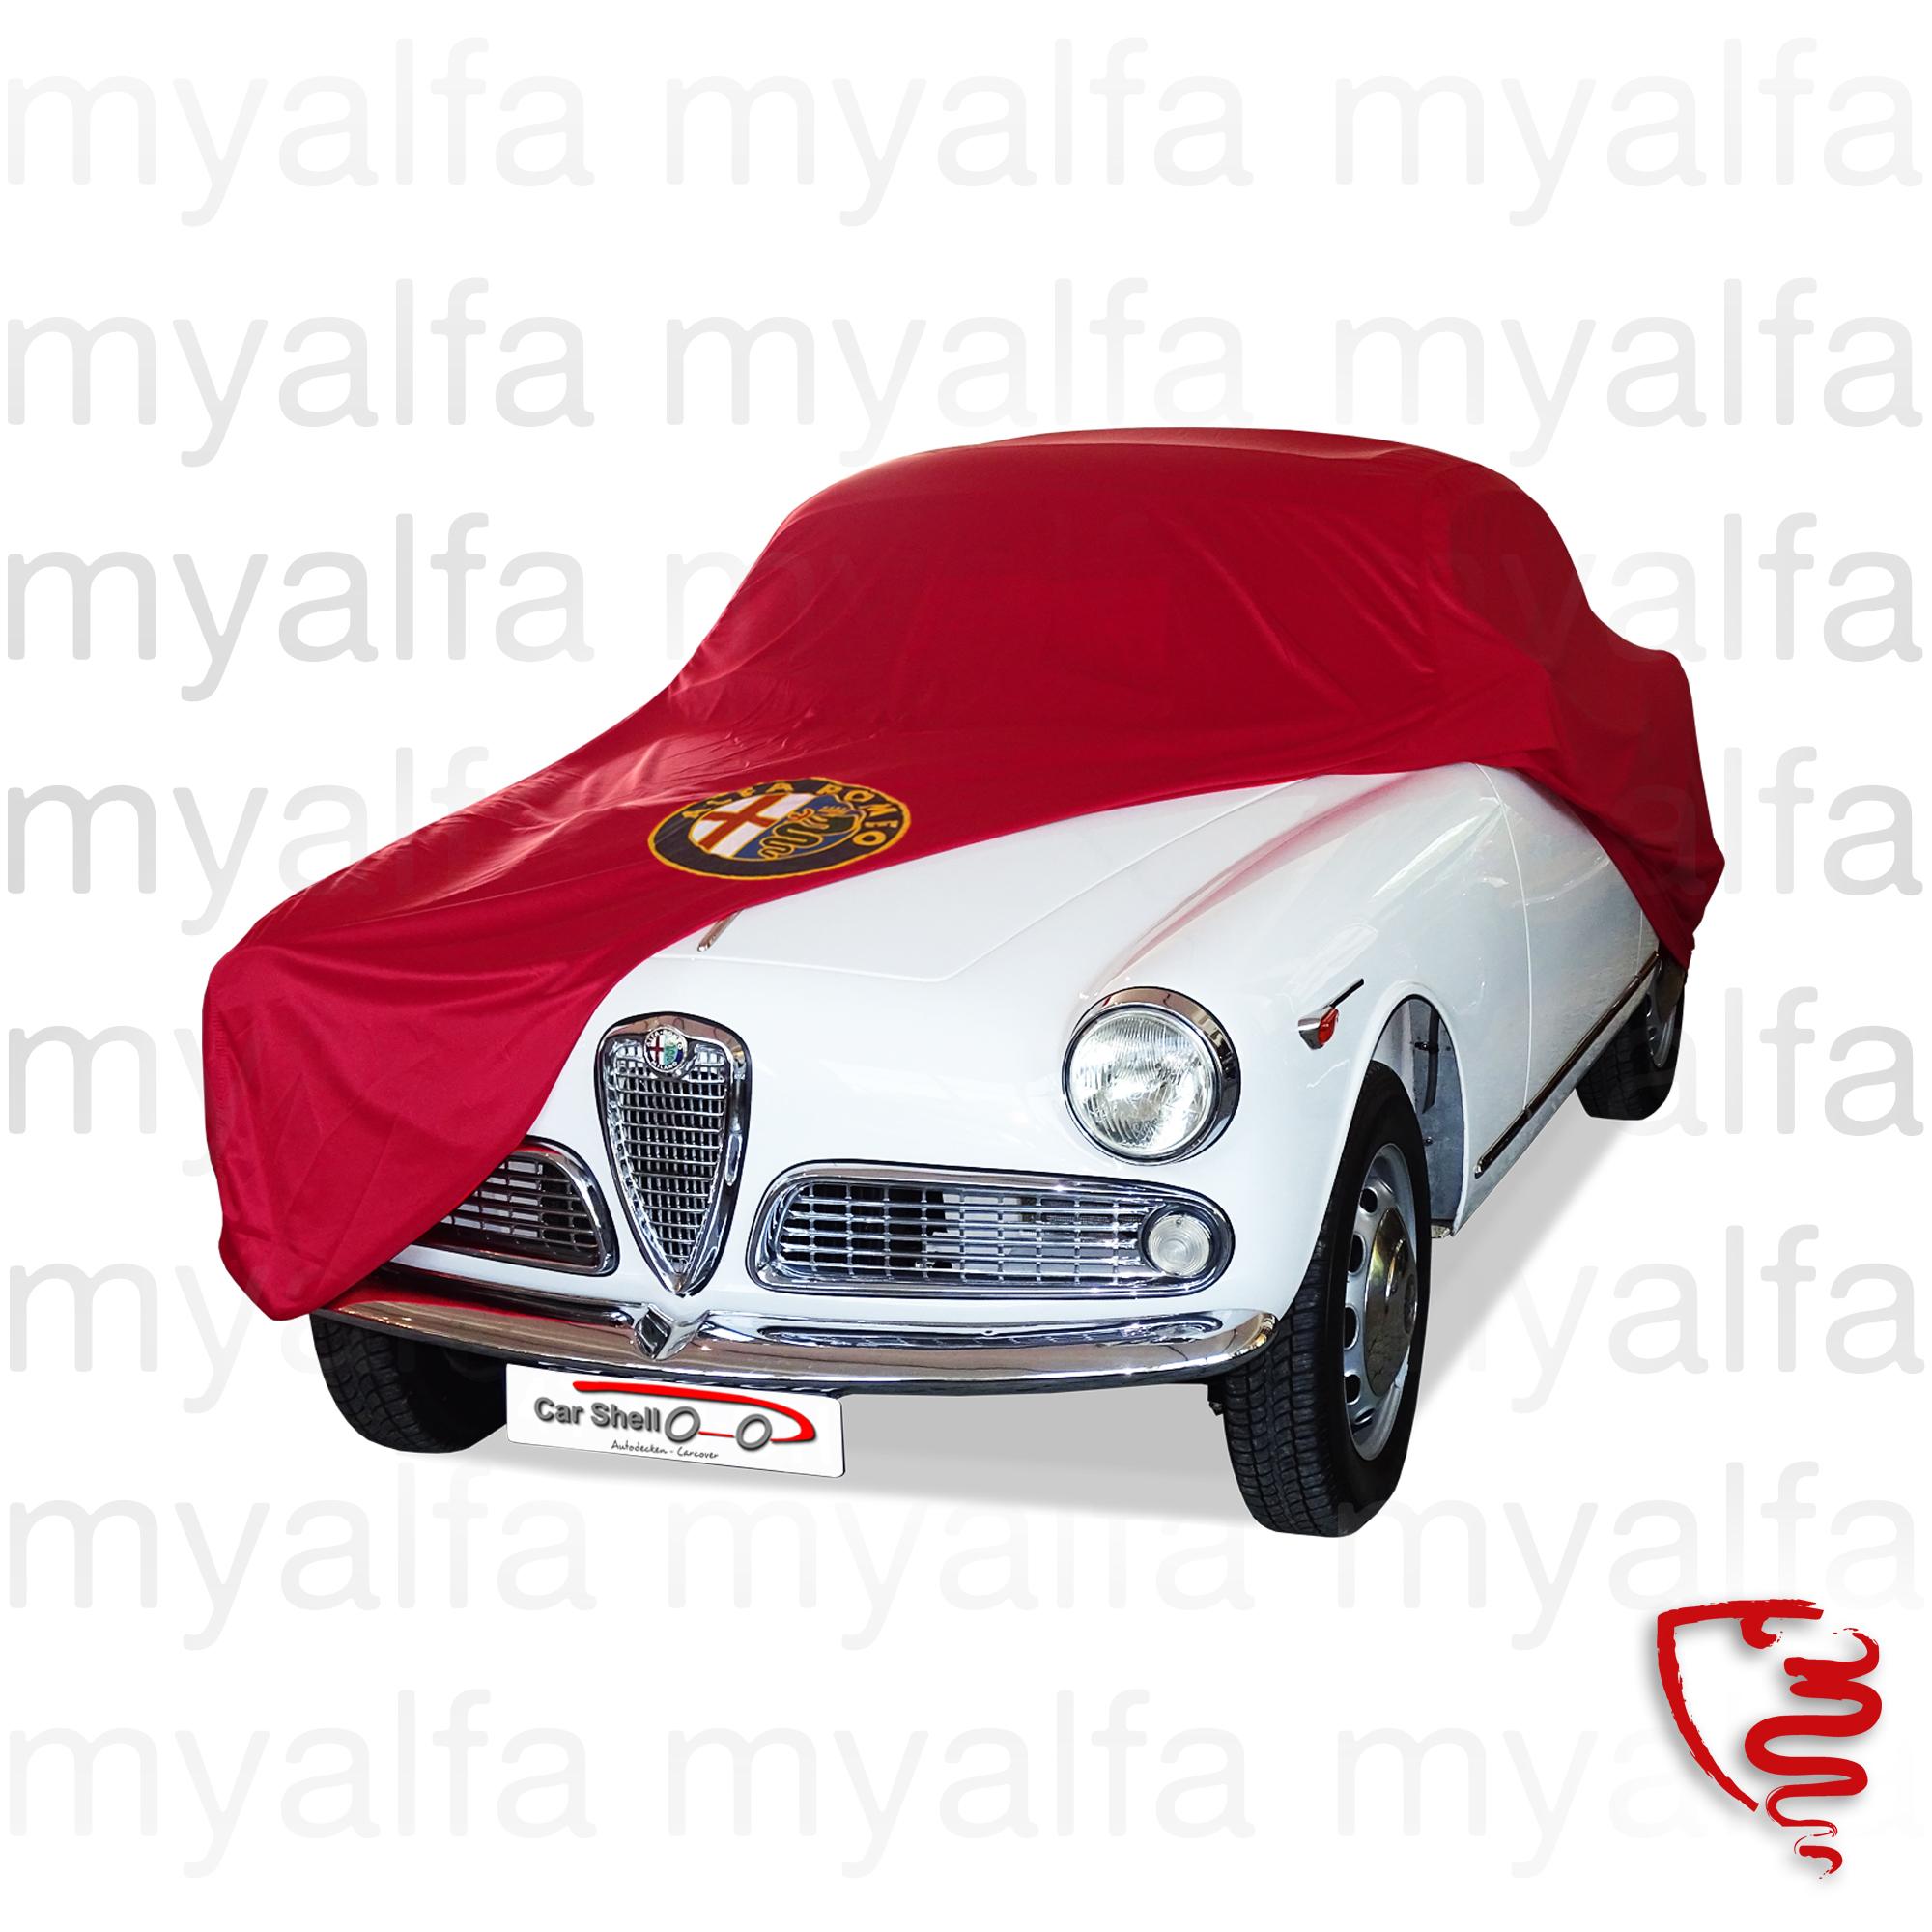 Cover Giulietta cover / Giulia Sprint w / emblem for 105/115, Accessories, Car Covers